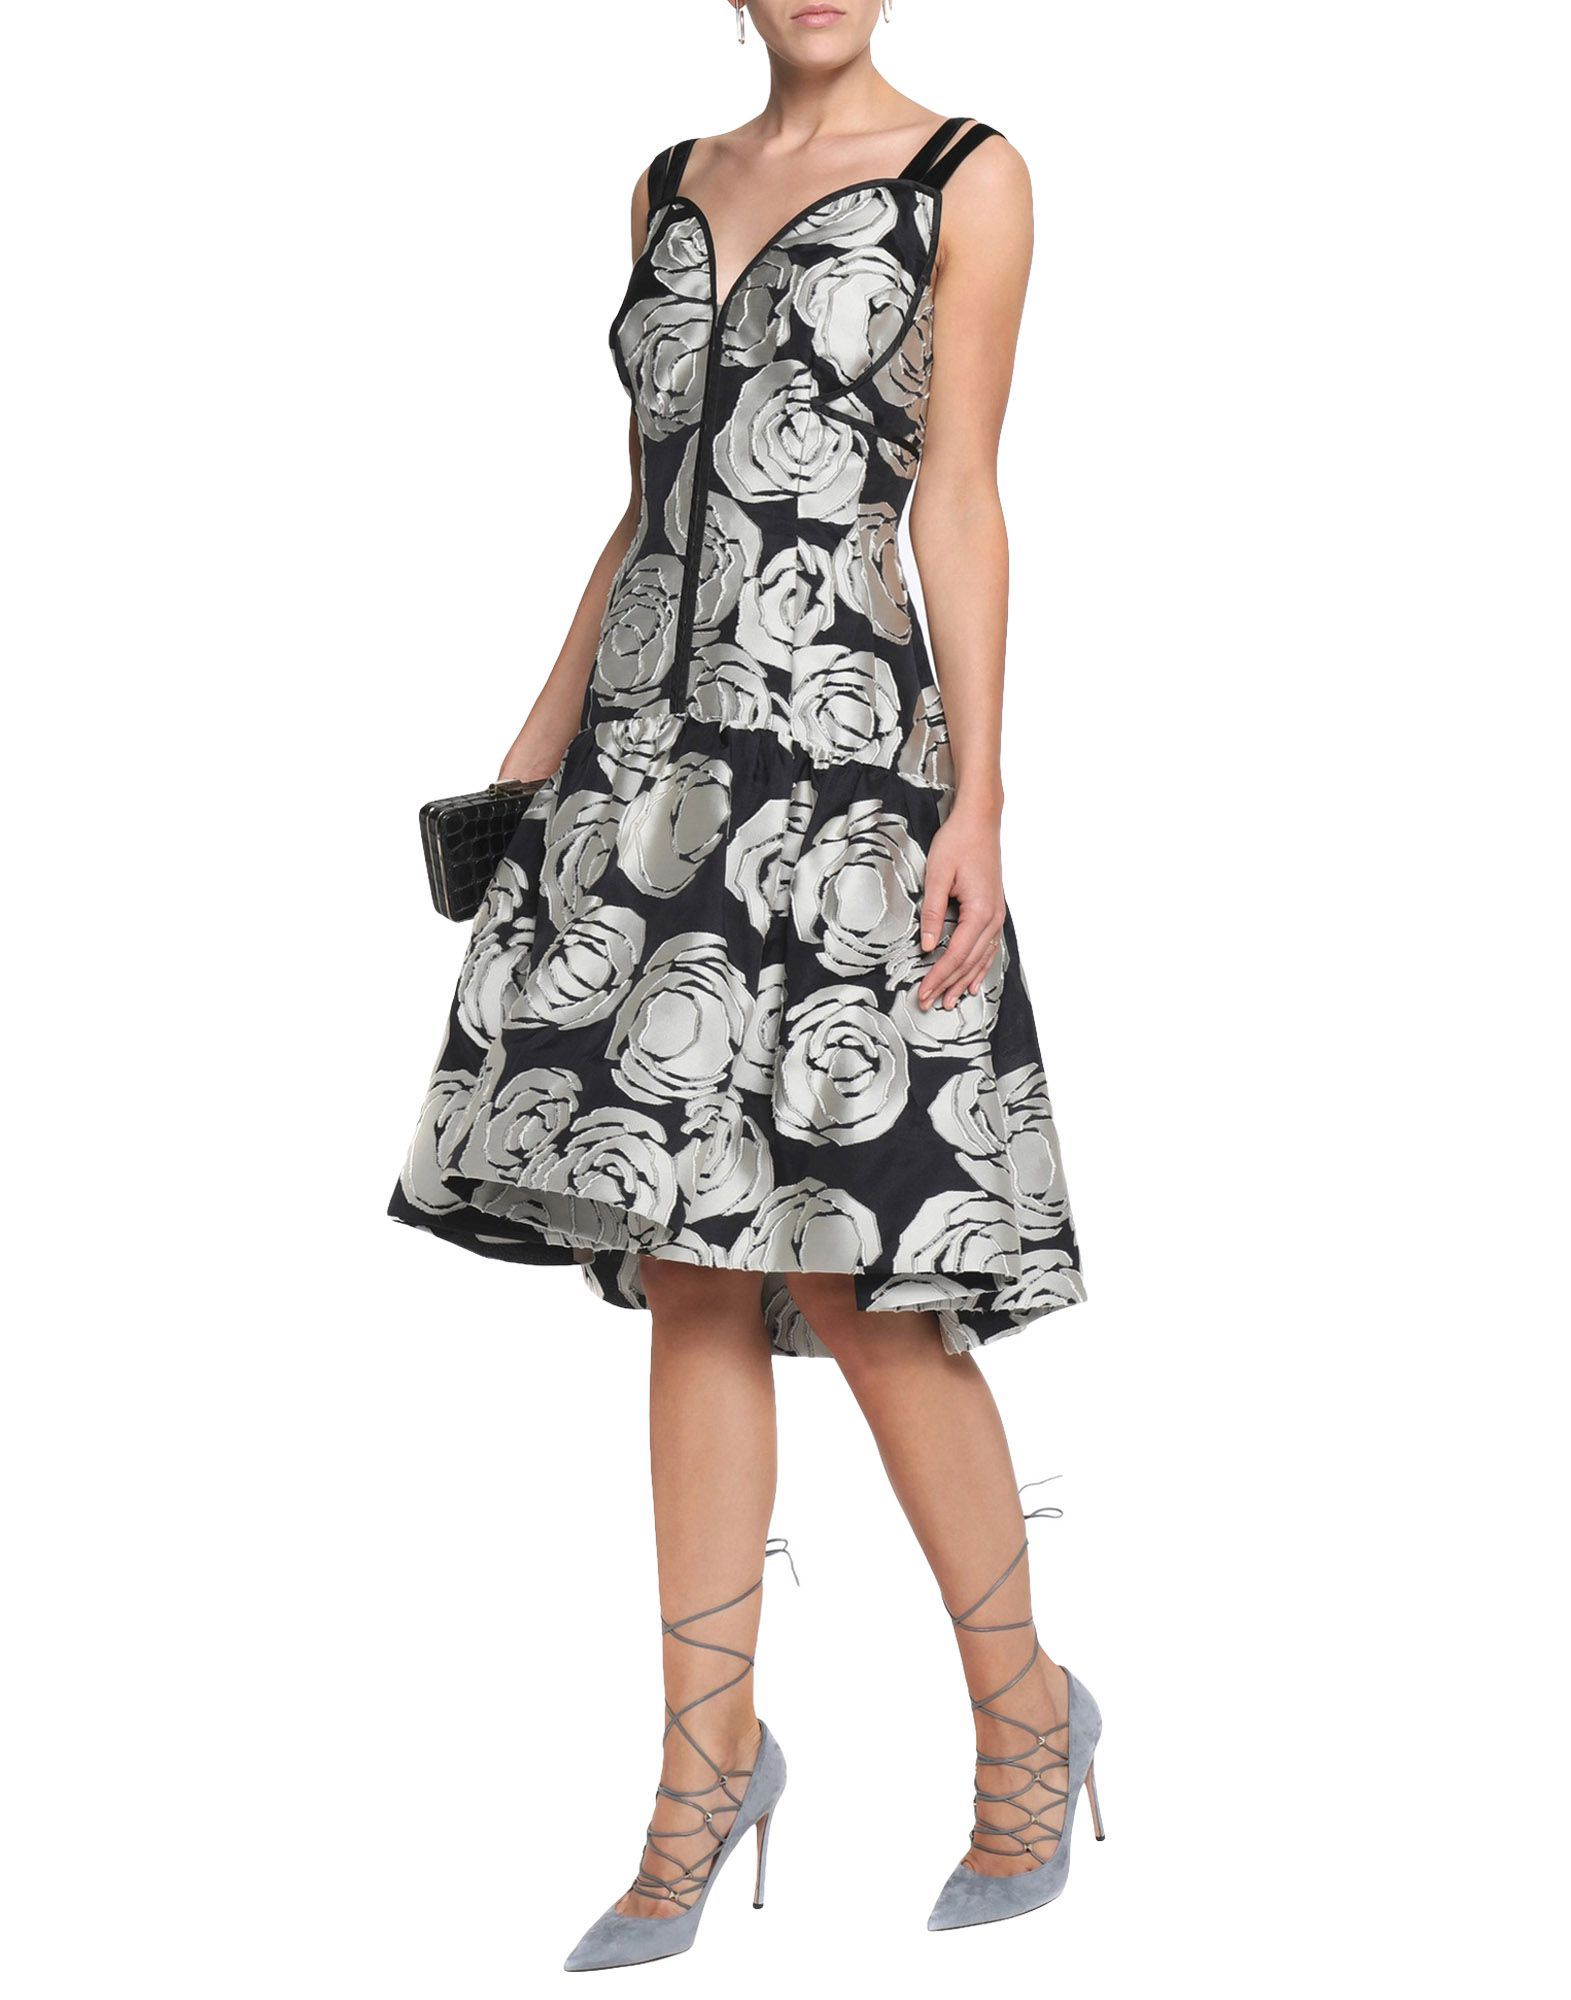 Oscar De La Renta Light Grey Silk Knee Length Dress